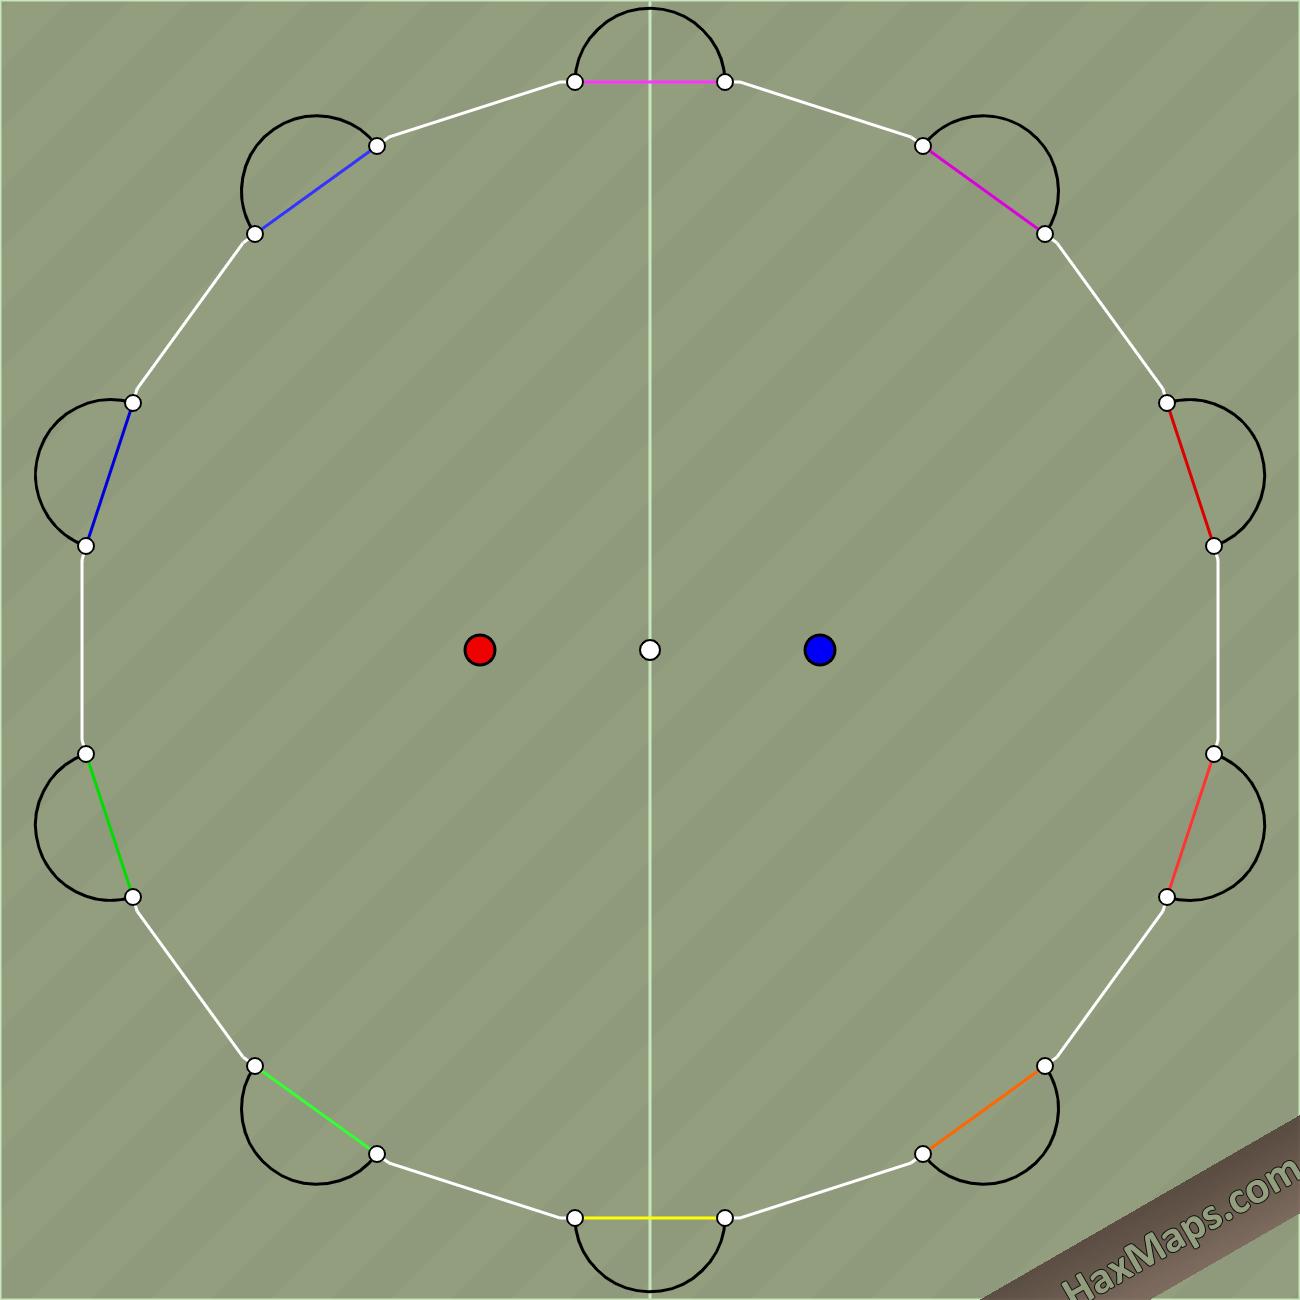 hax ball maps | 10 MAN BY RAMBO HTML5